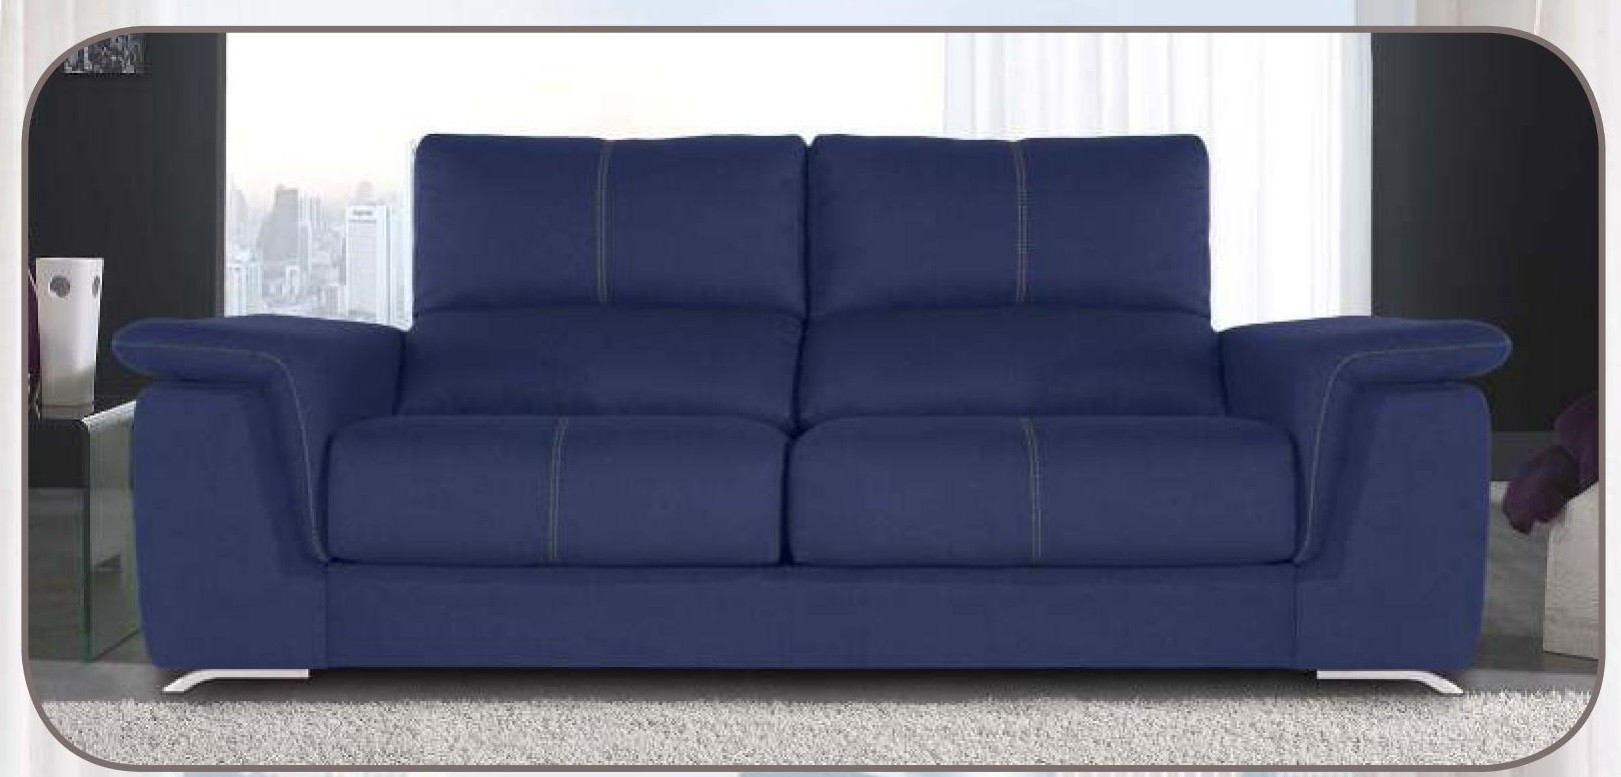 Sof s chaise longue 3 y 2 relax oferta mobles sedavi for Sofas chaise longue ofertas